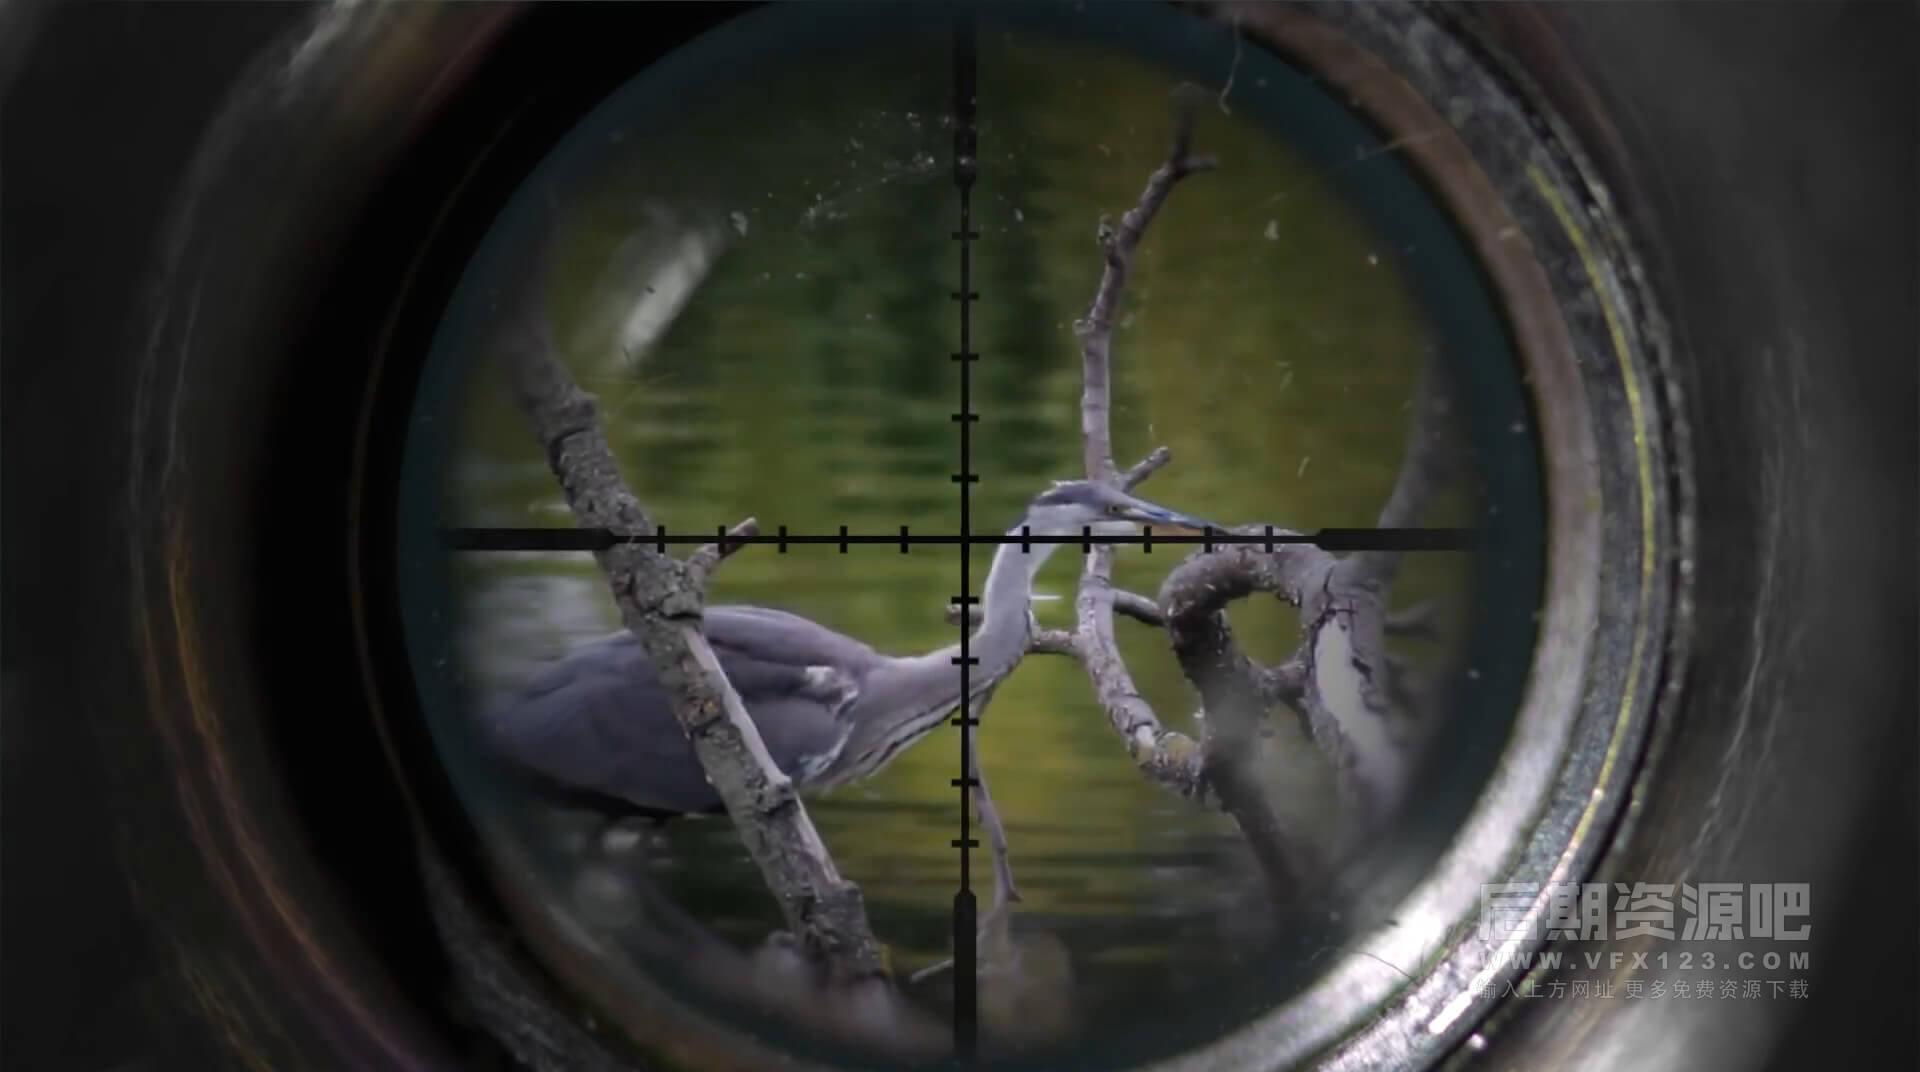 FCPX效果插件 望远镜瞄准镜效果 Binocular Scope Effects